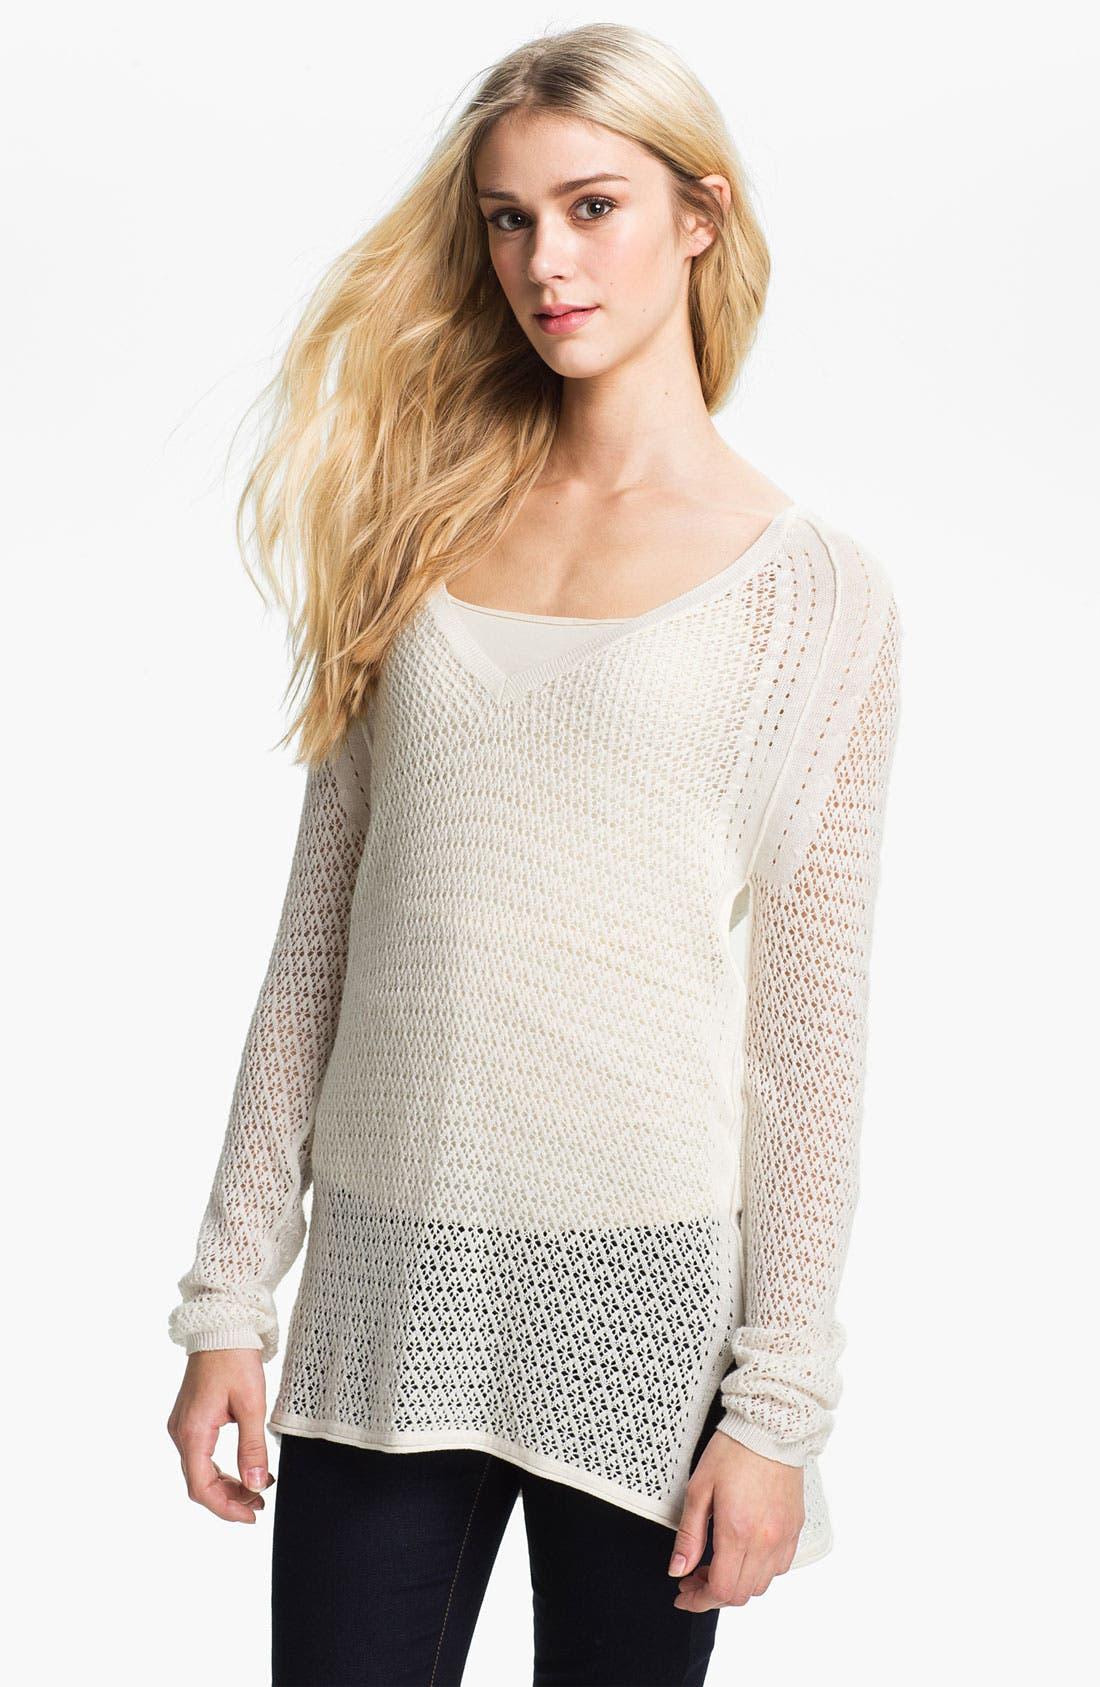 Alternate Image 1 Selected - Ella Moss 'Julia' Pointelle Tunic Sweater